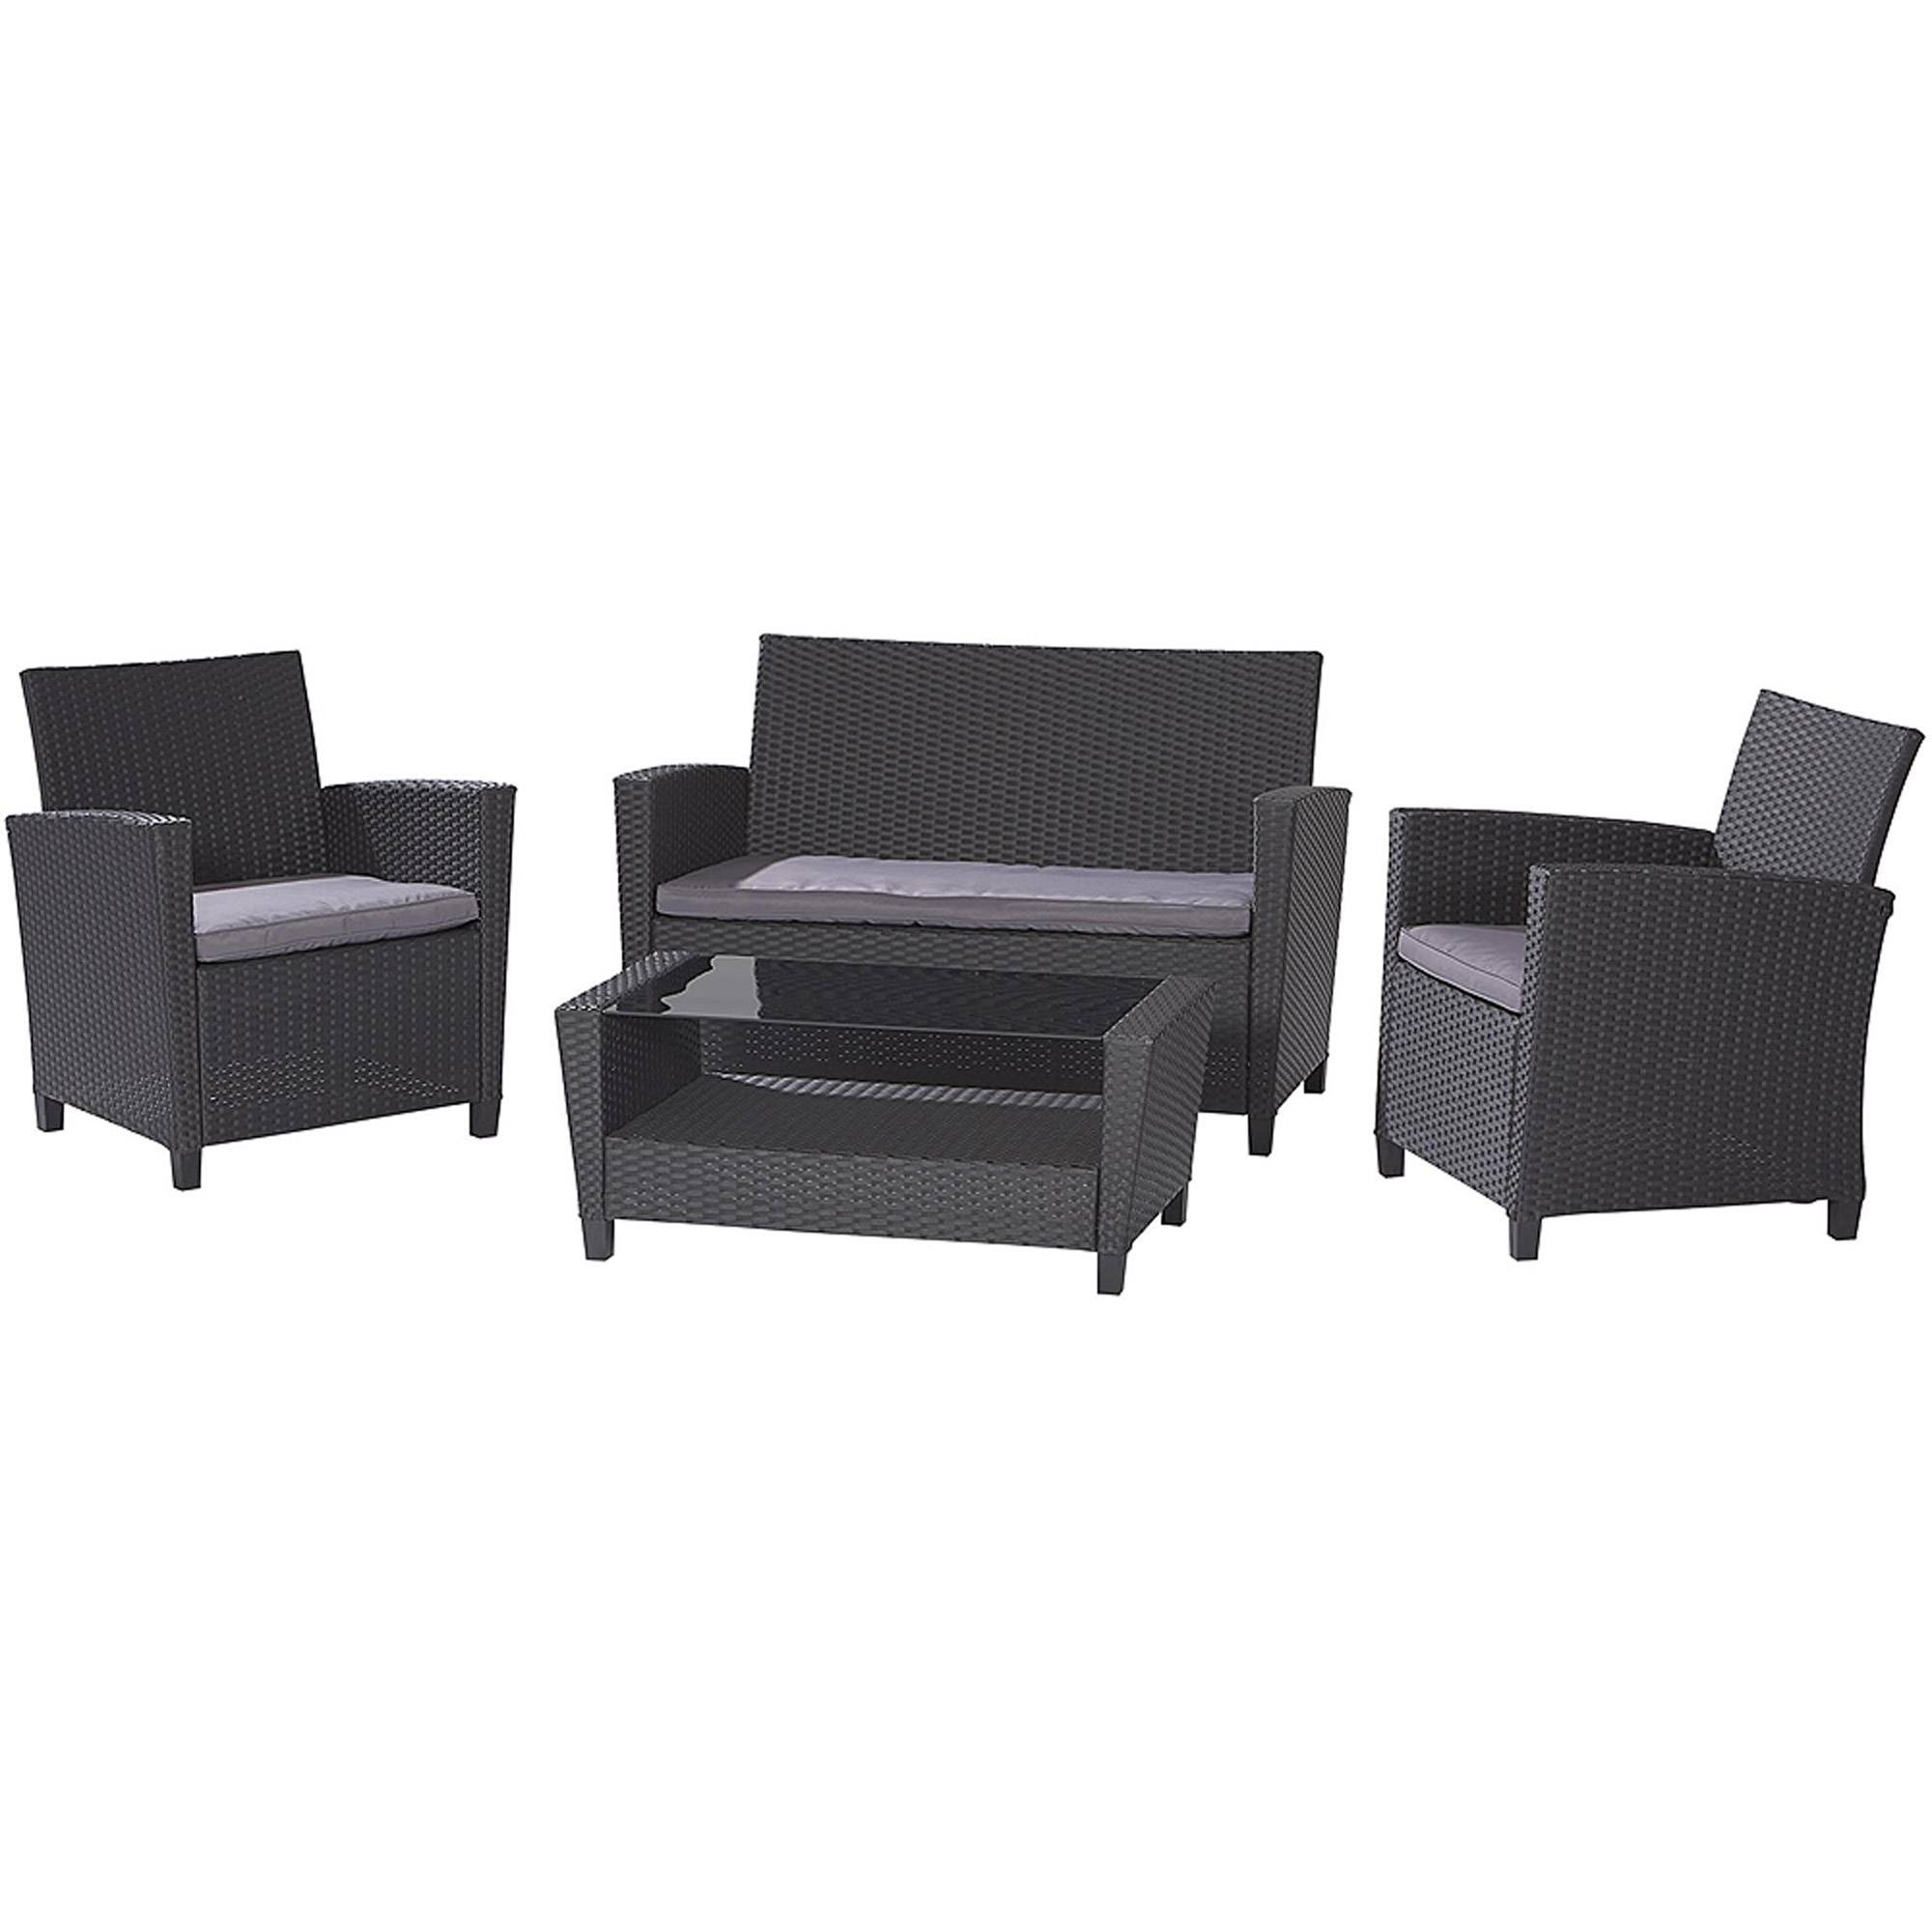 Cosco Outdoor Malmo 4 Piece Resin Wicker Patio Conversation Set Regarding Black Wicker Sofas (View 7 of 15)